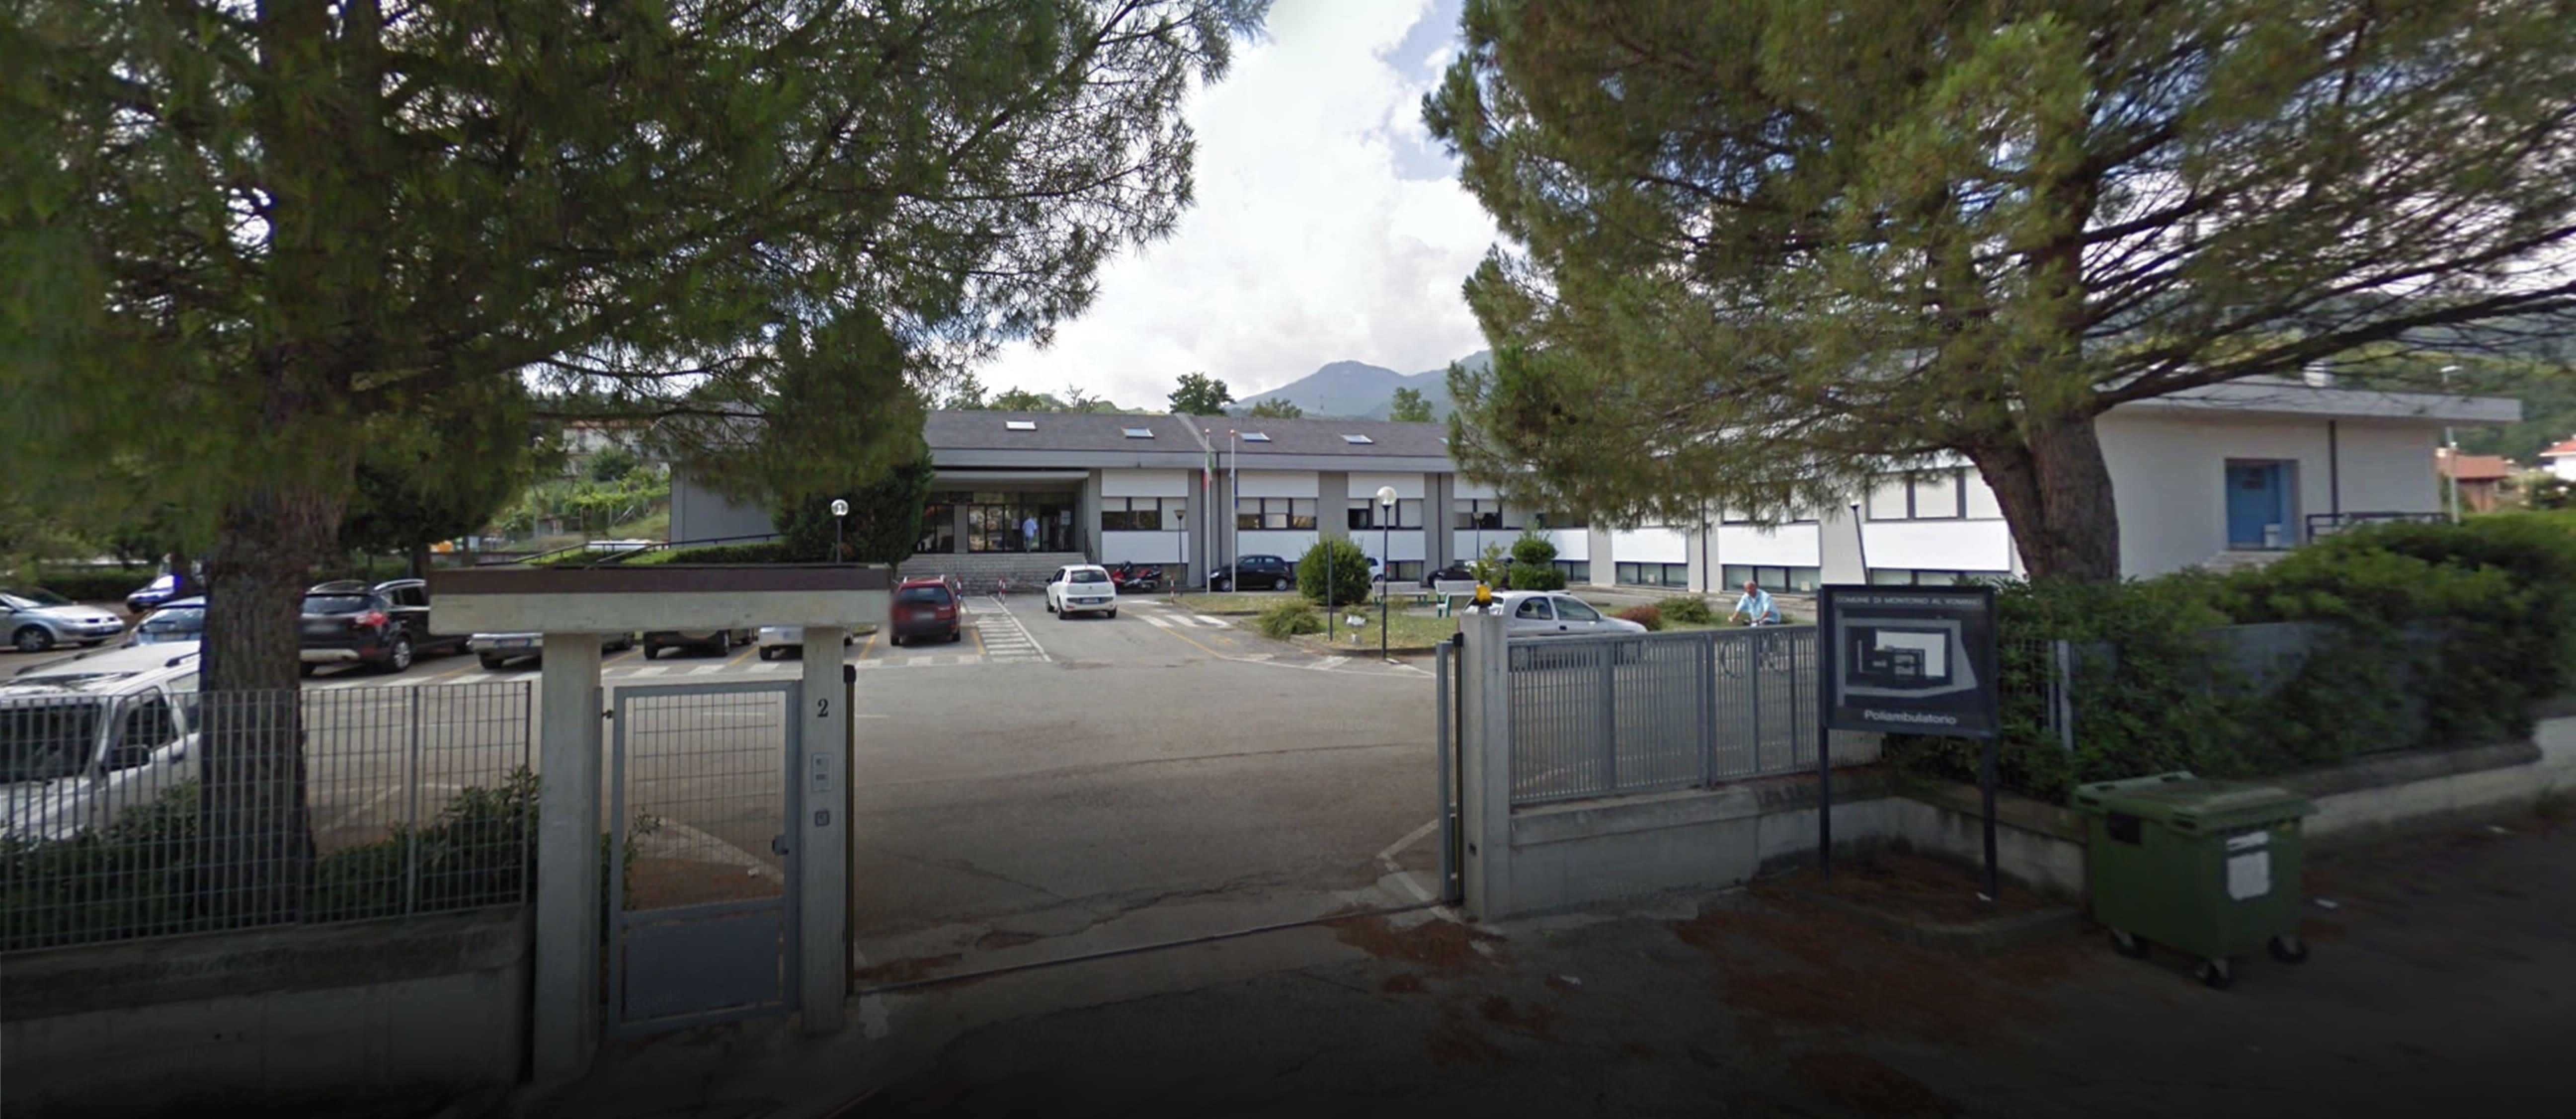 distretto-montorio